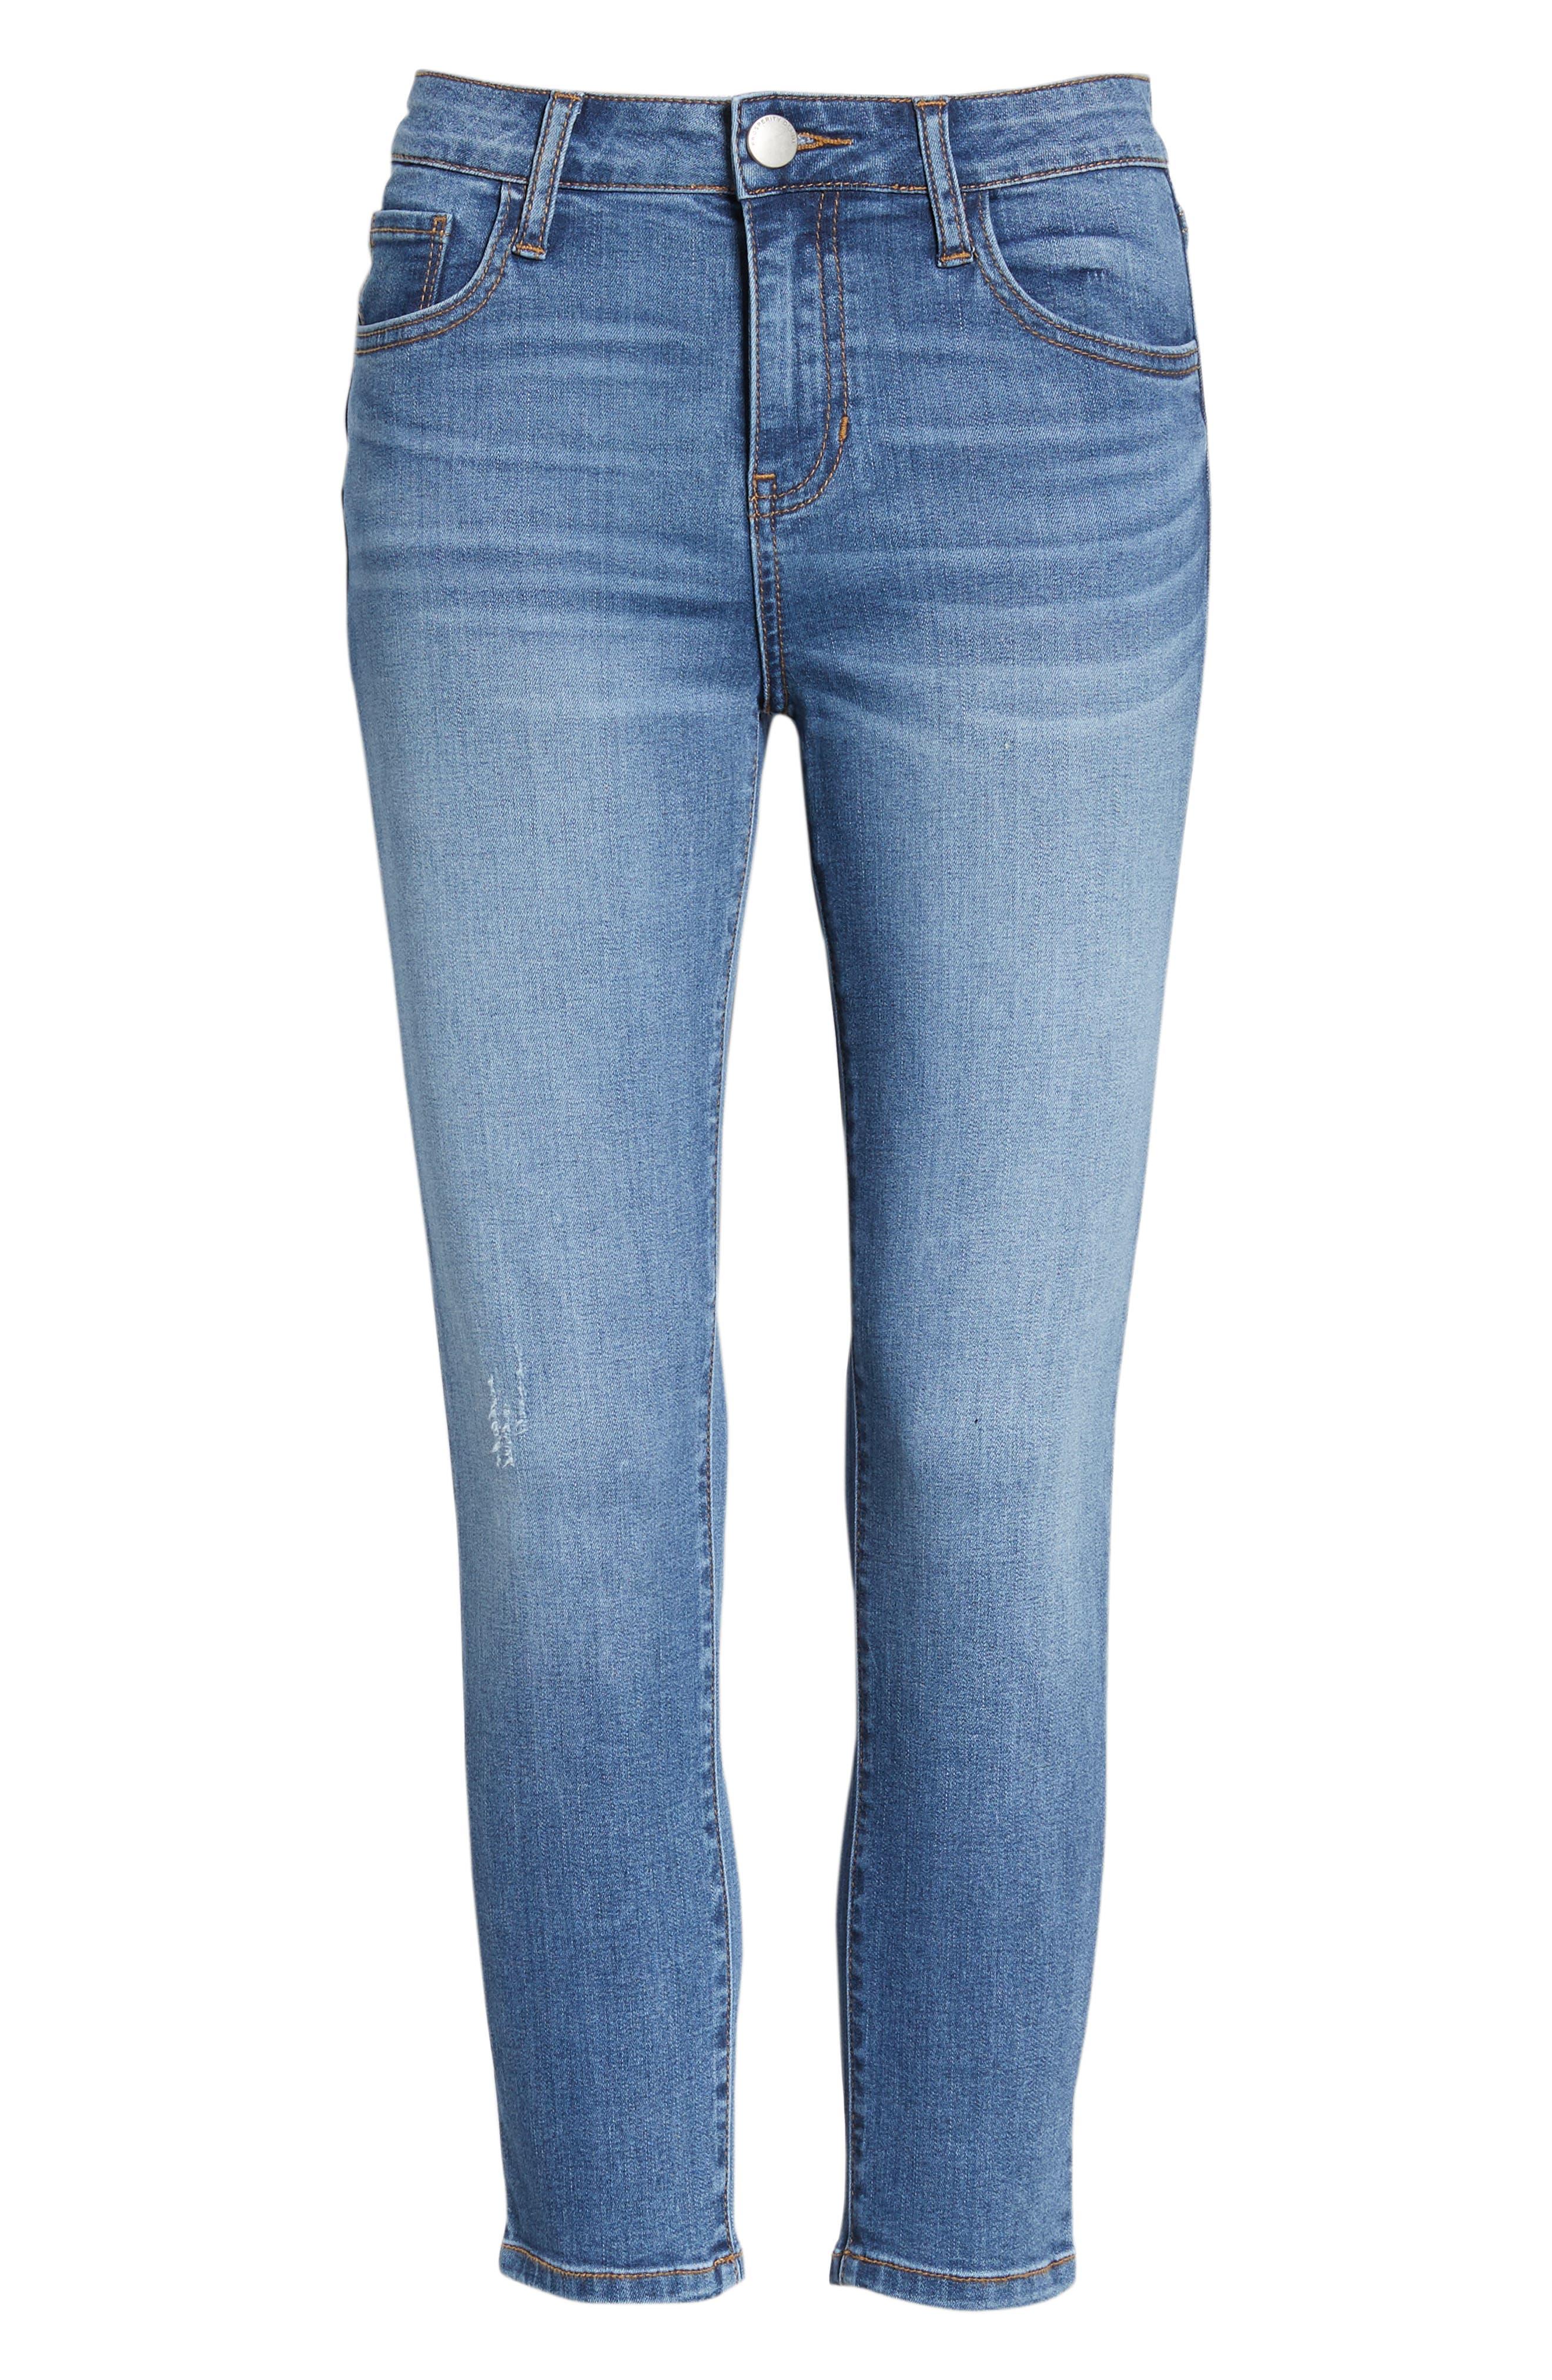 Crop Skinny Jeans,                             Alternate thumbnail 7, color,                             MEDIUM WASH